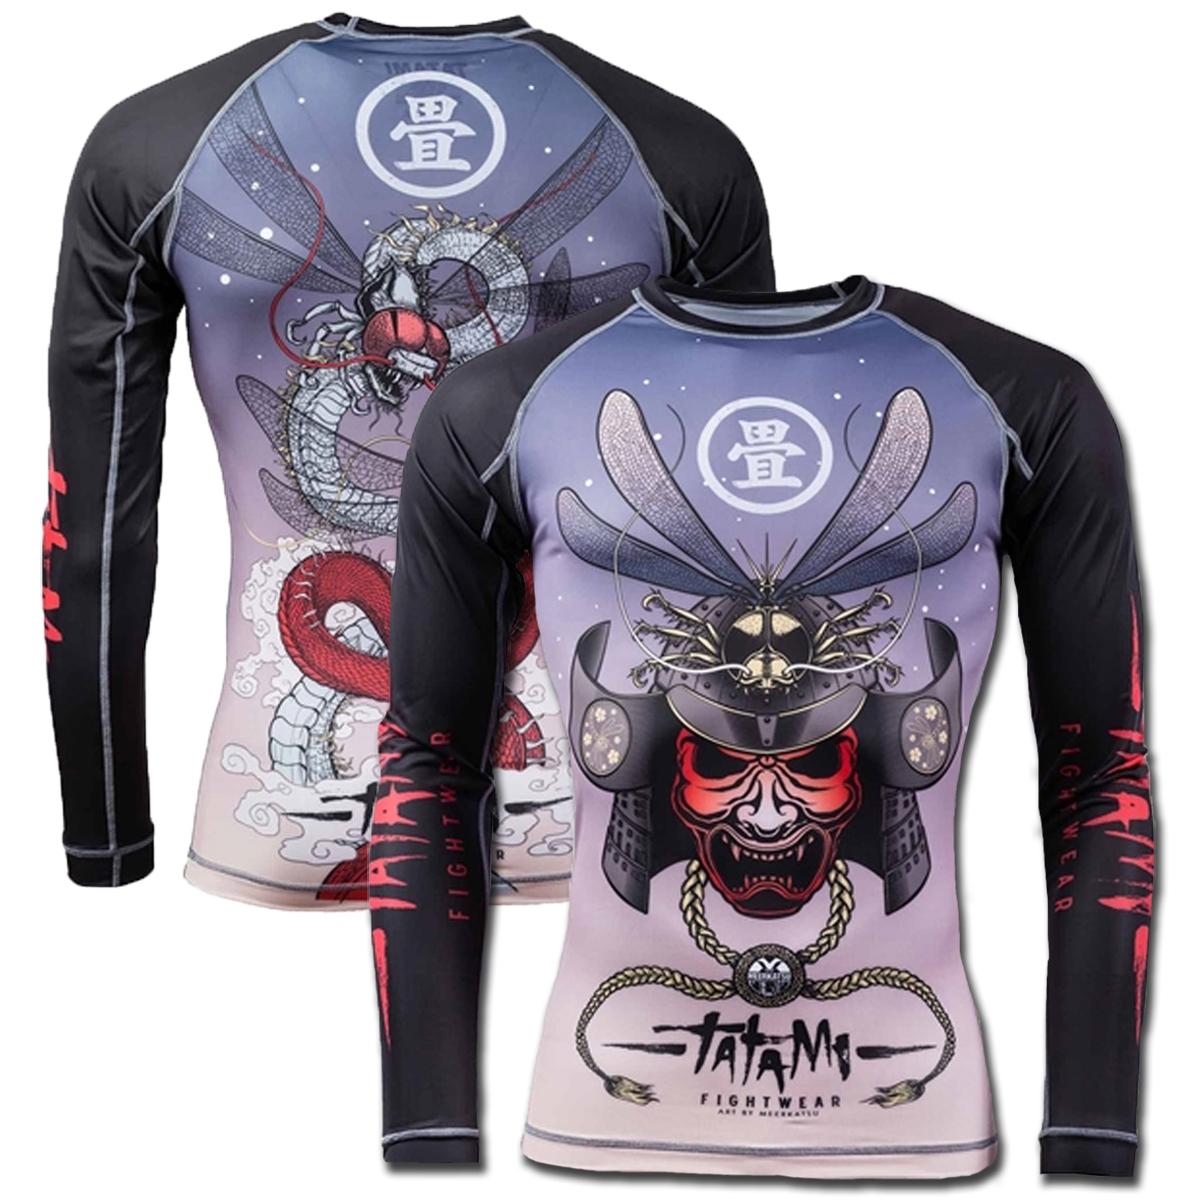 Tatami X Meerkatsu Dragonfly V2 MMA BJJ Jiu Jitsu Long Sleeve LS Rashguard